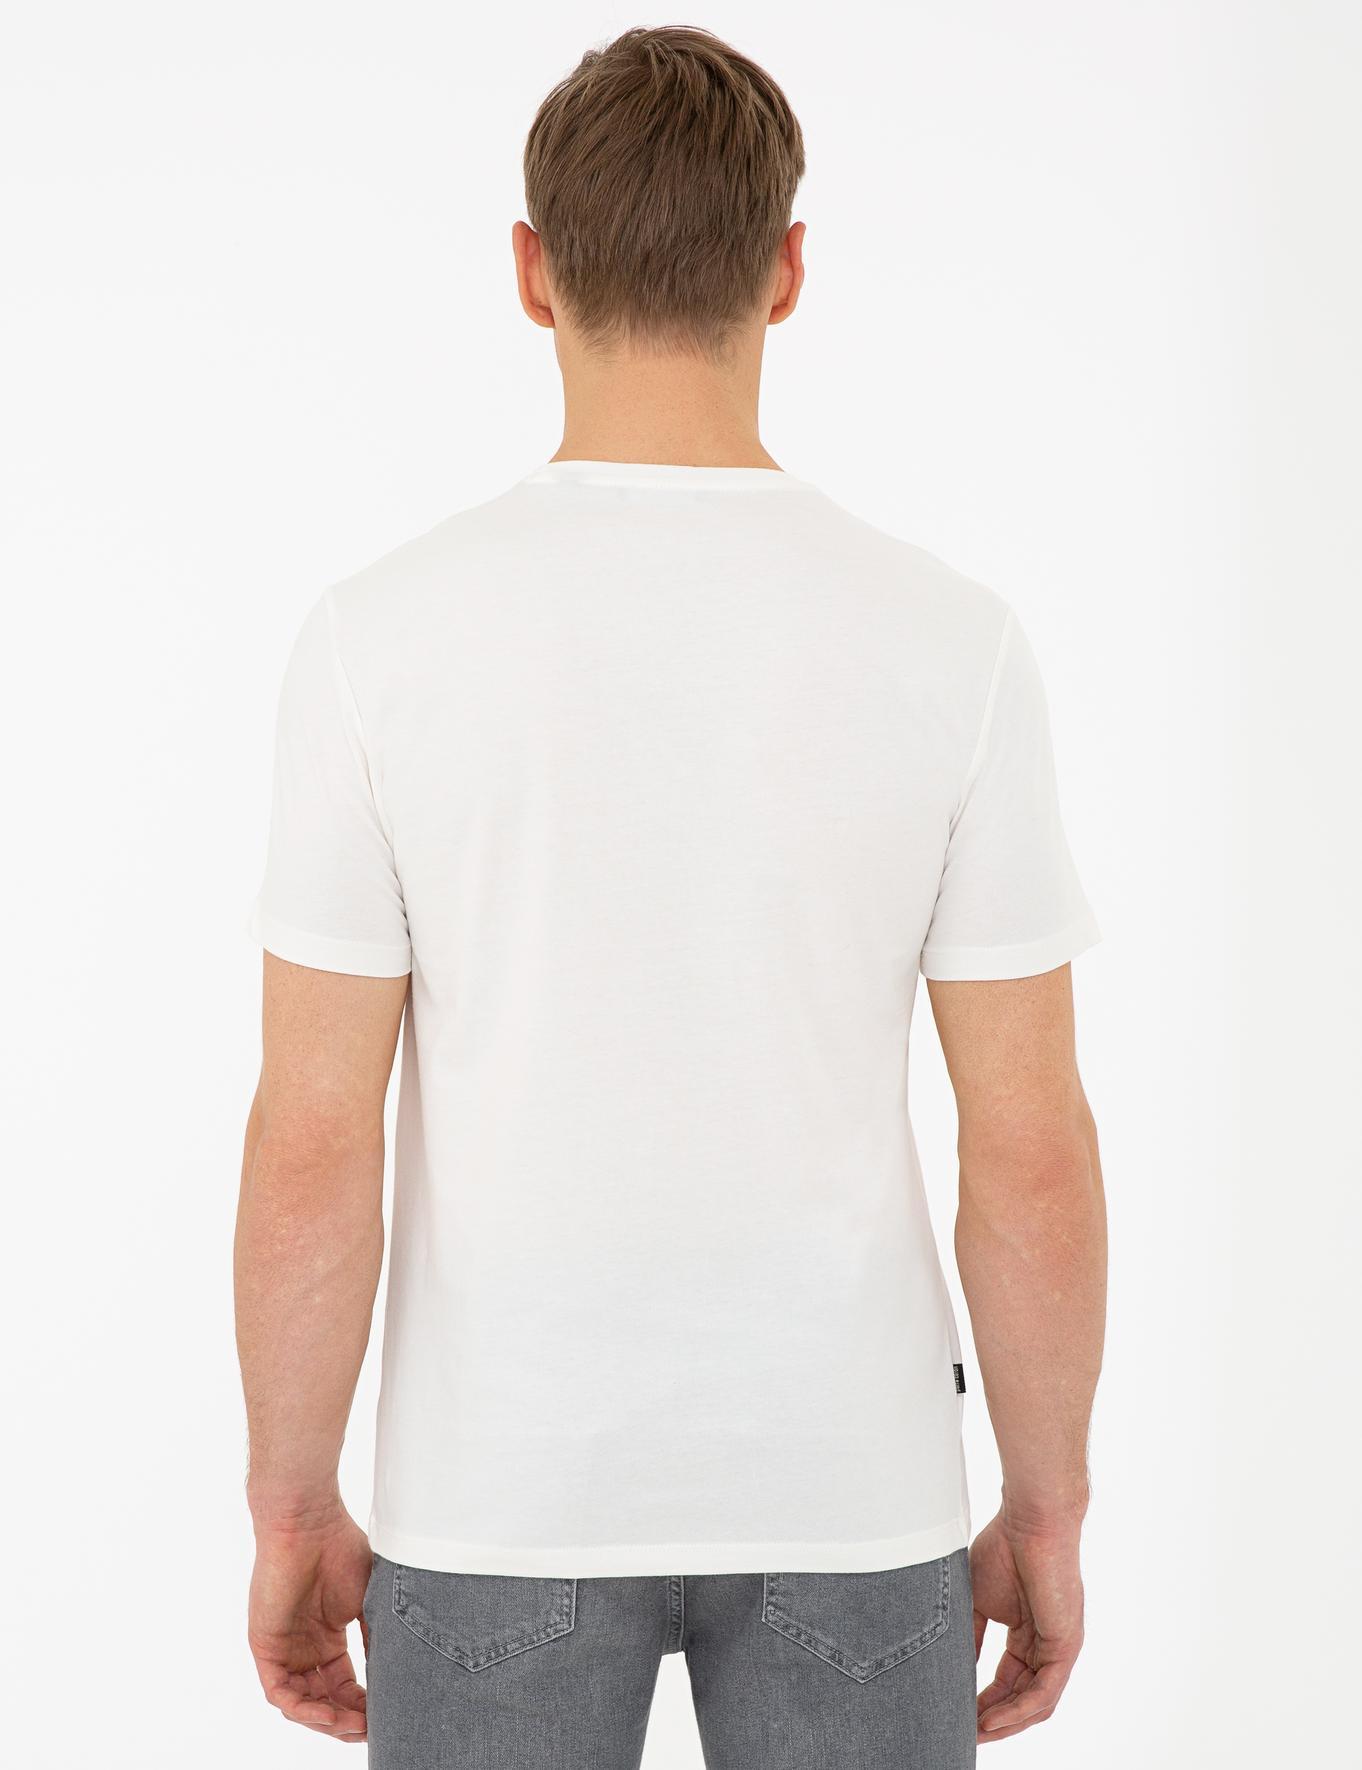 Gri Slim Fit Bisiklet Yaka T-Shirt